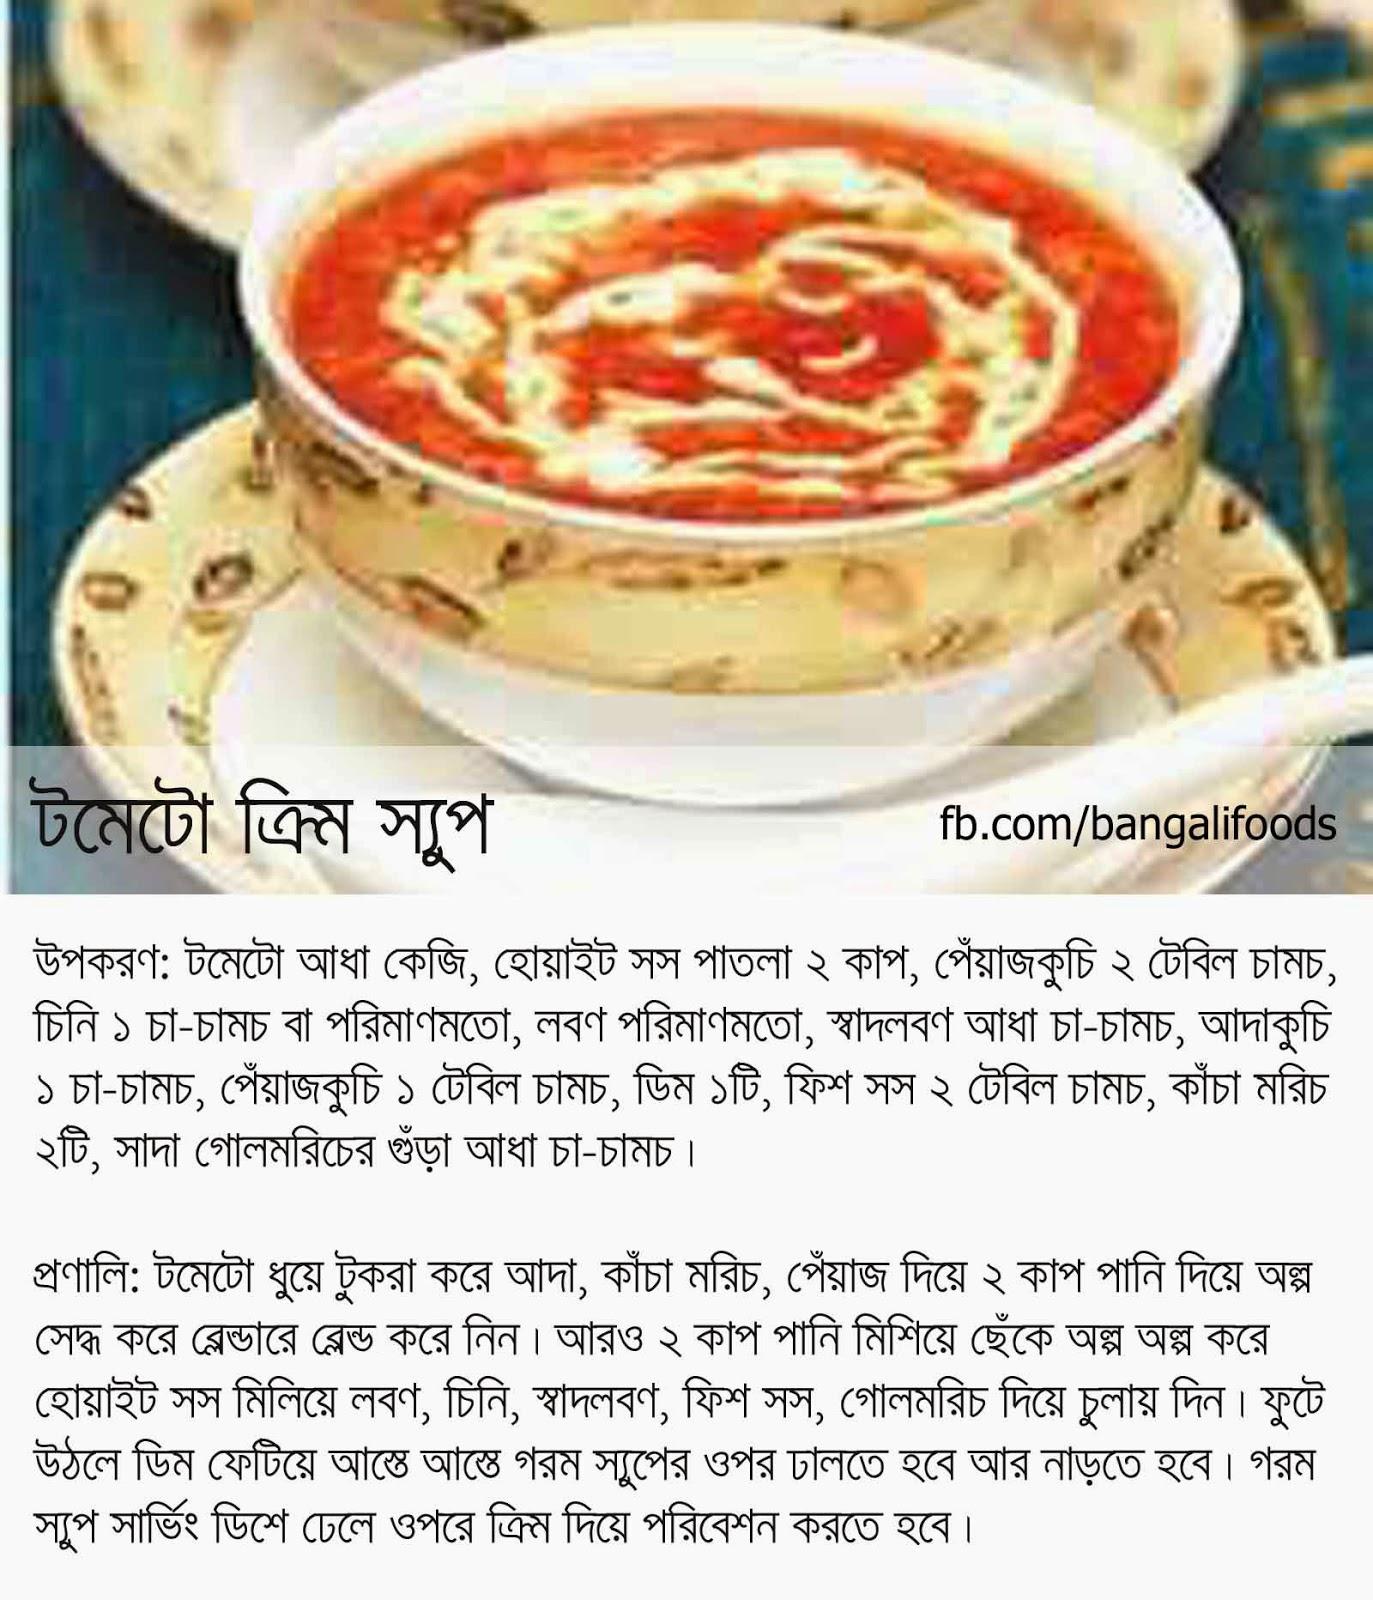 Bangali foods bengali style soup recipe tomato cream soup forumfinder Images